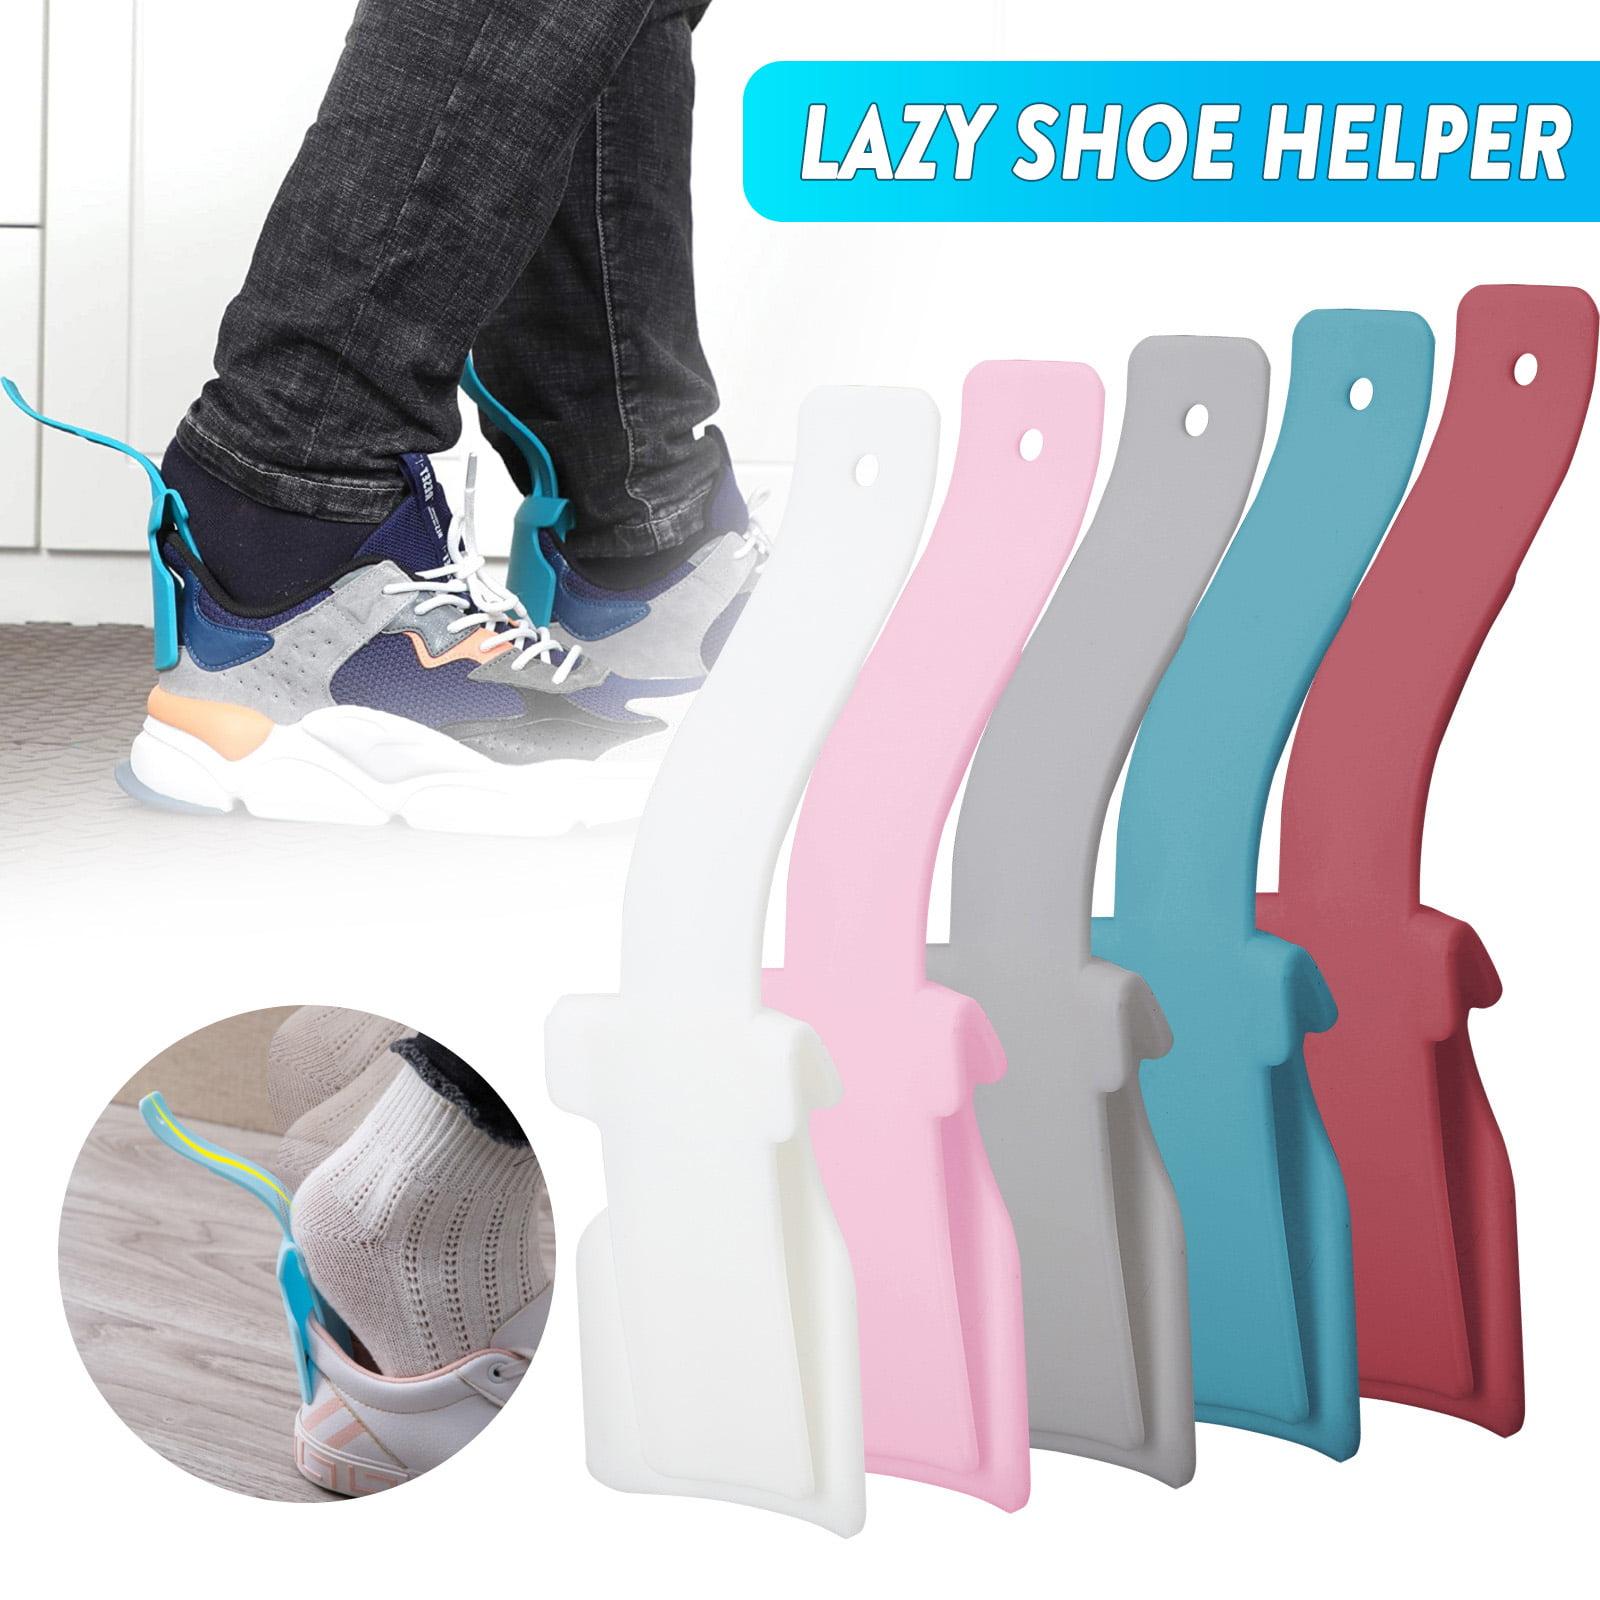 10 Pieces Lazy Shoe Helper Shoe Lifting Helper Shoe Portable Handled Shoe Horn for Most Shoes